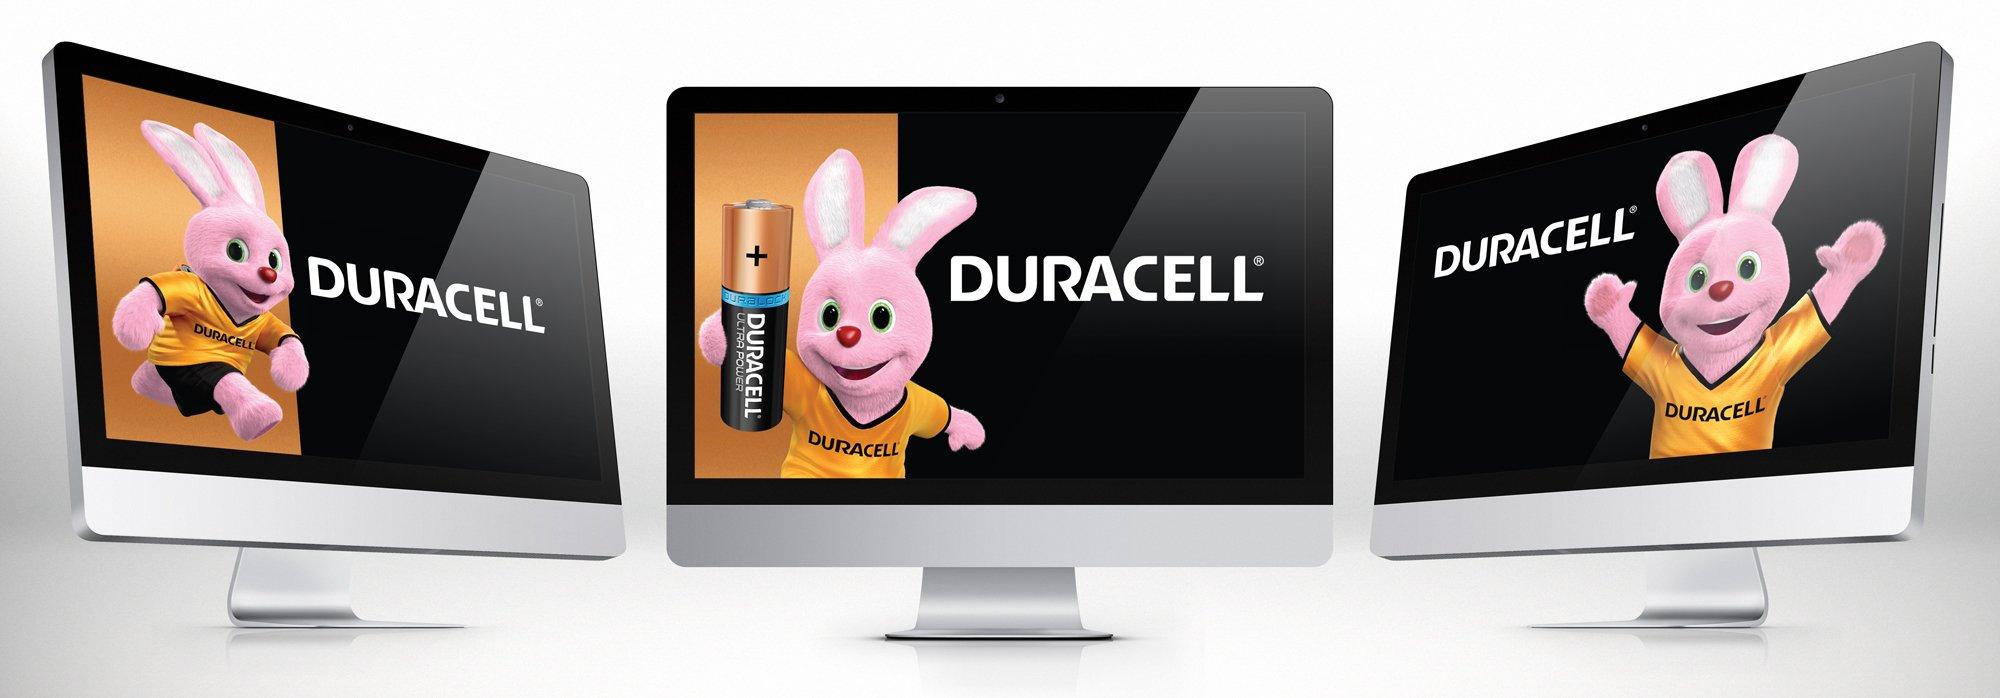 DuraceLL-IMAC-SS2